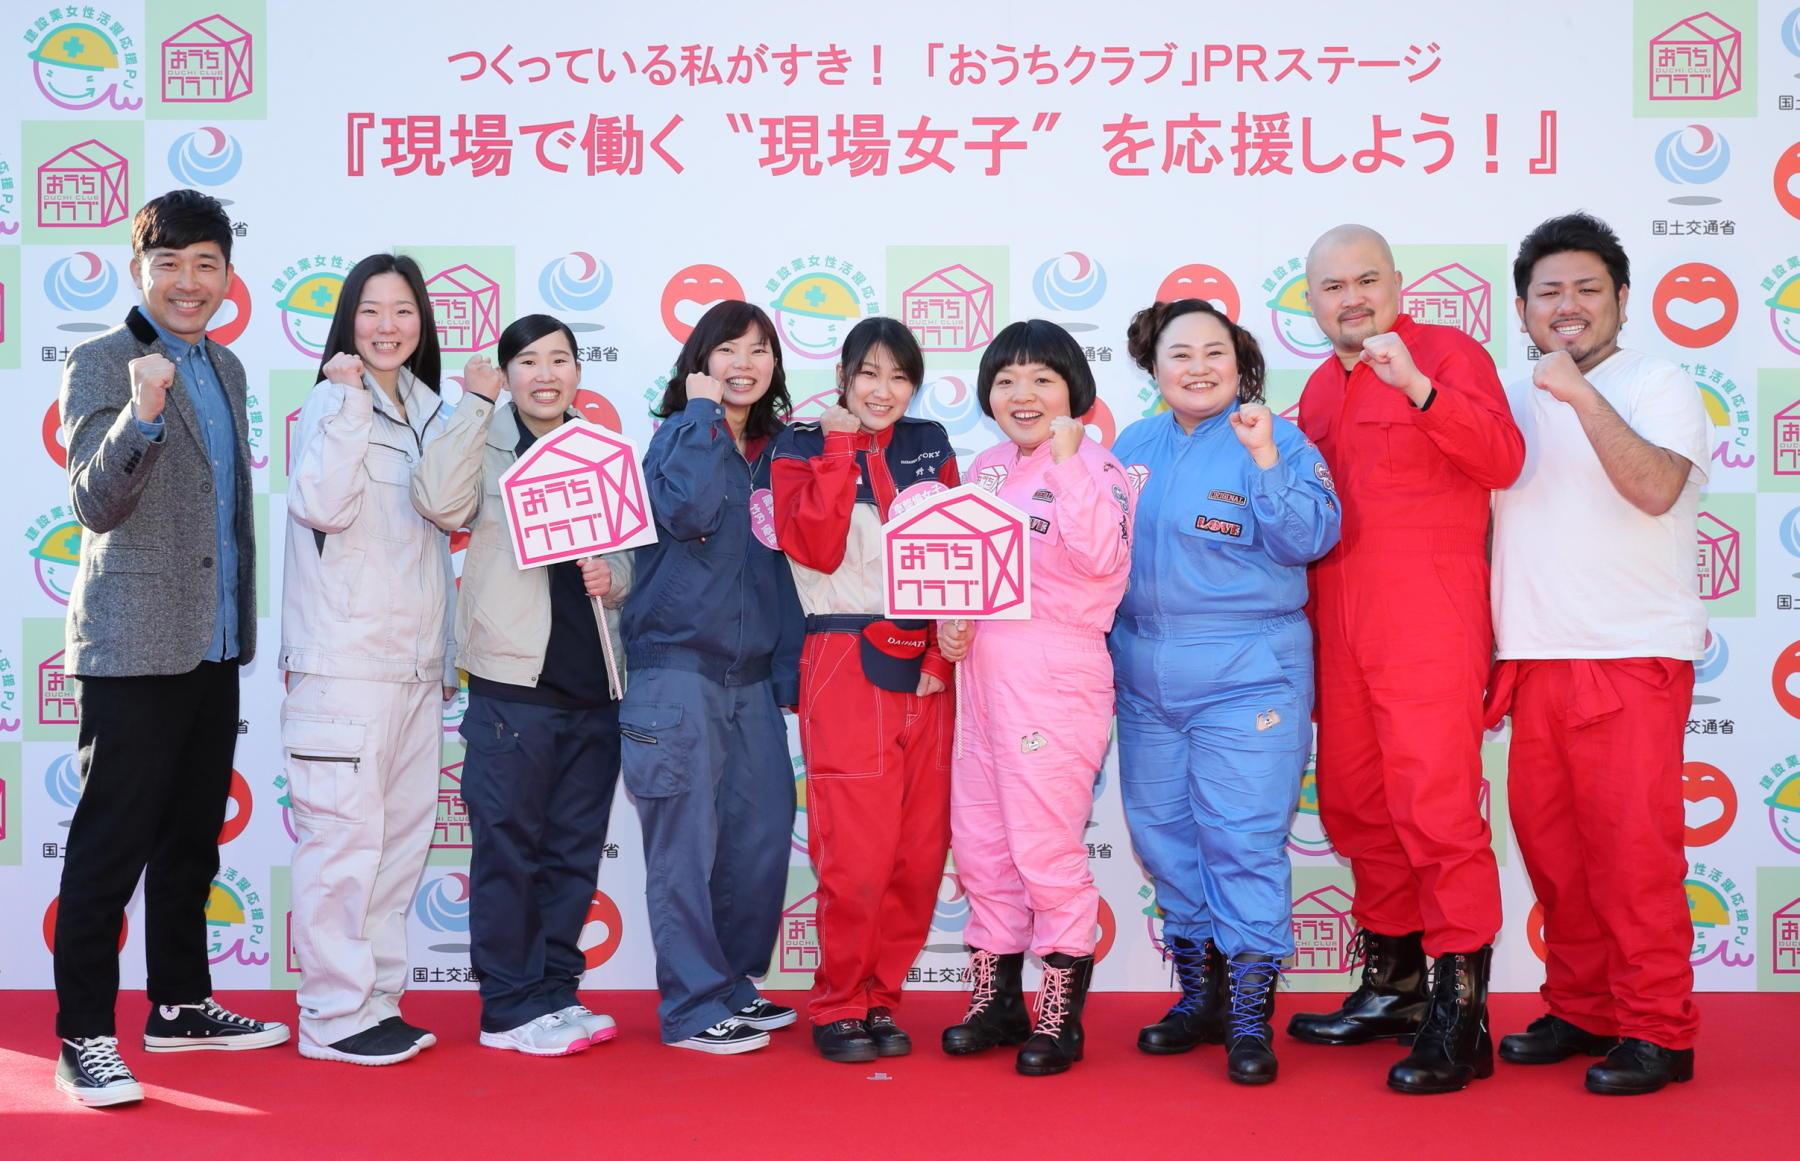 http://news.yoshimoto.co.jp/20170226094903-c11923879151a879f787715519c5b2d426f043b4.jpg